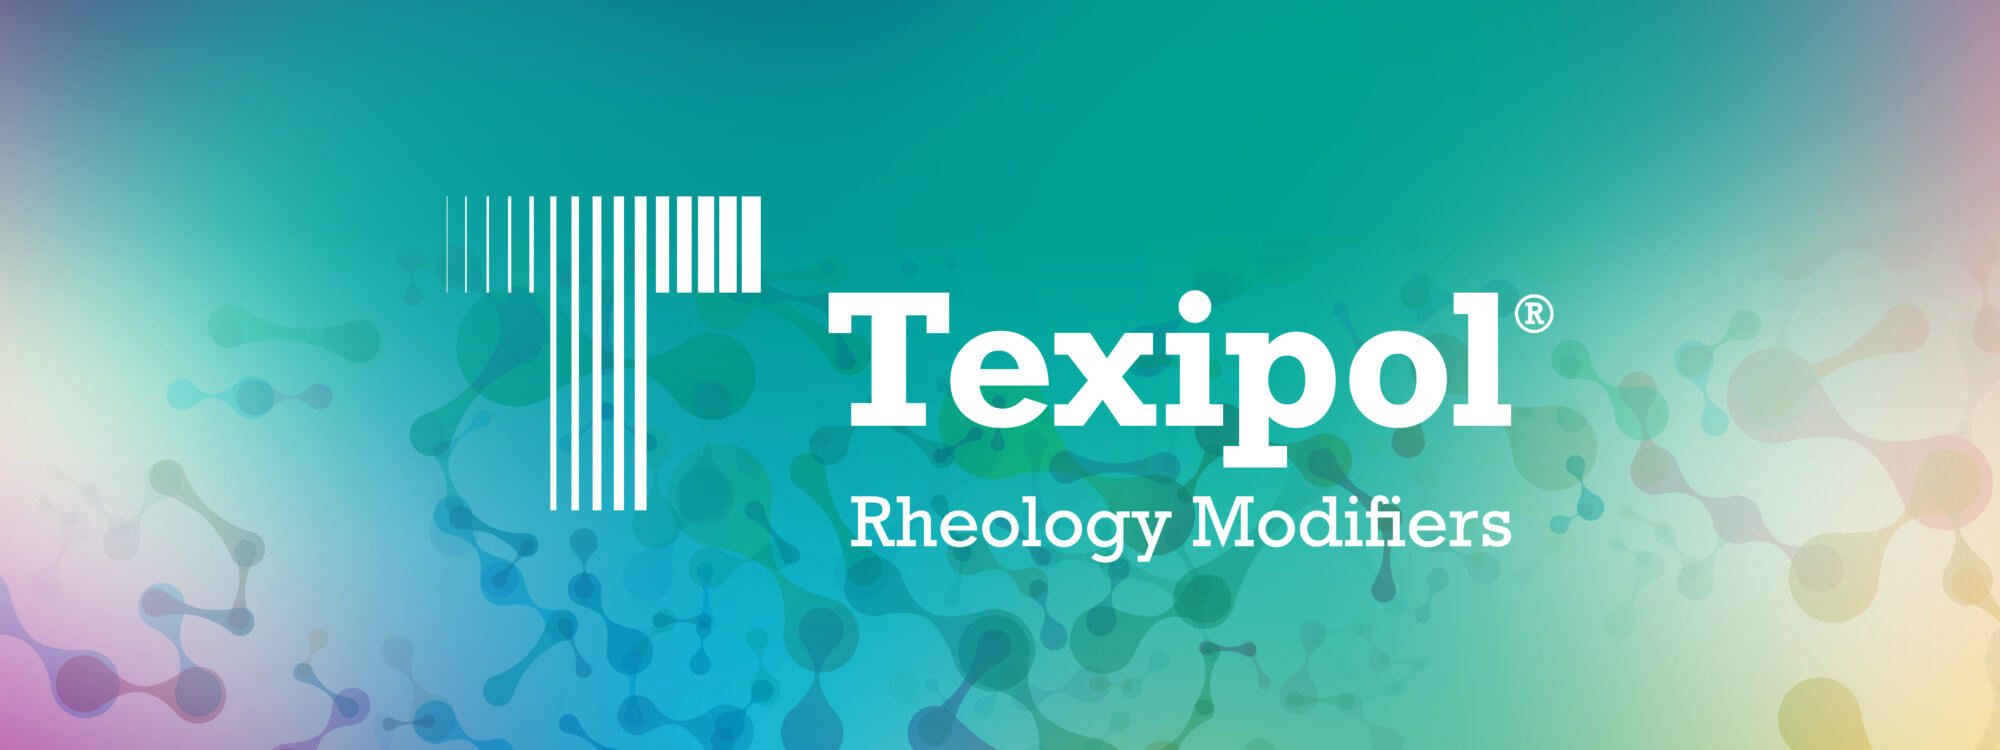 Texipol 63-201